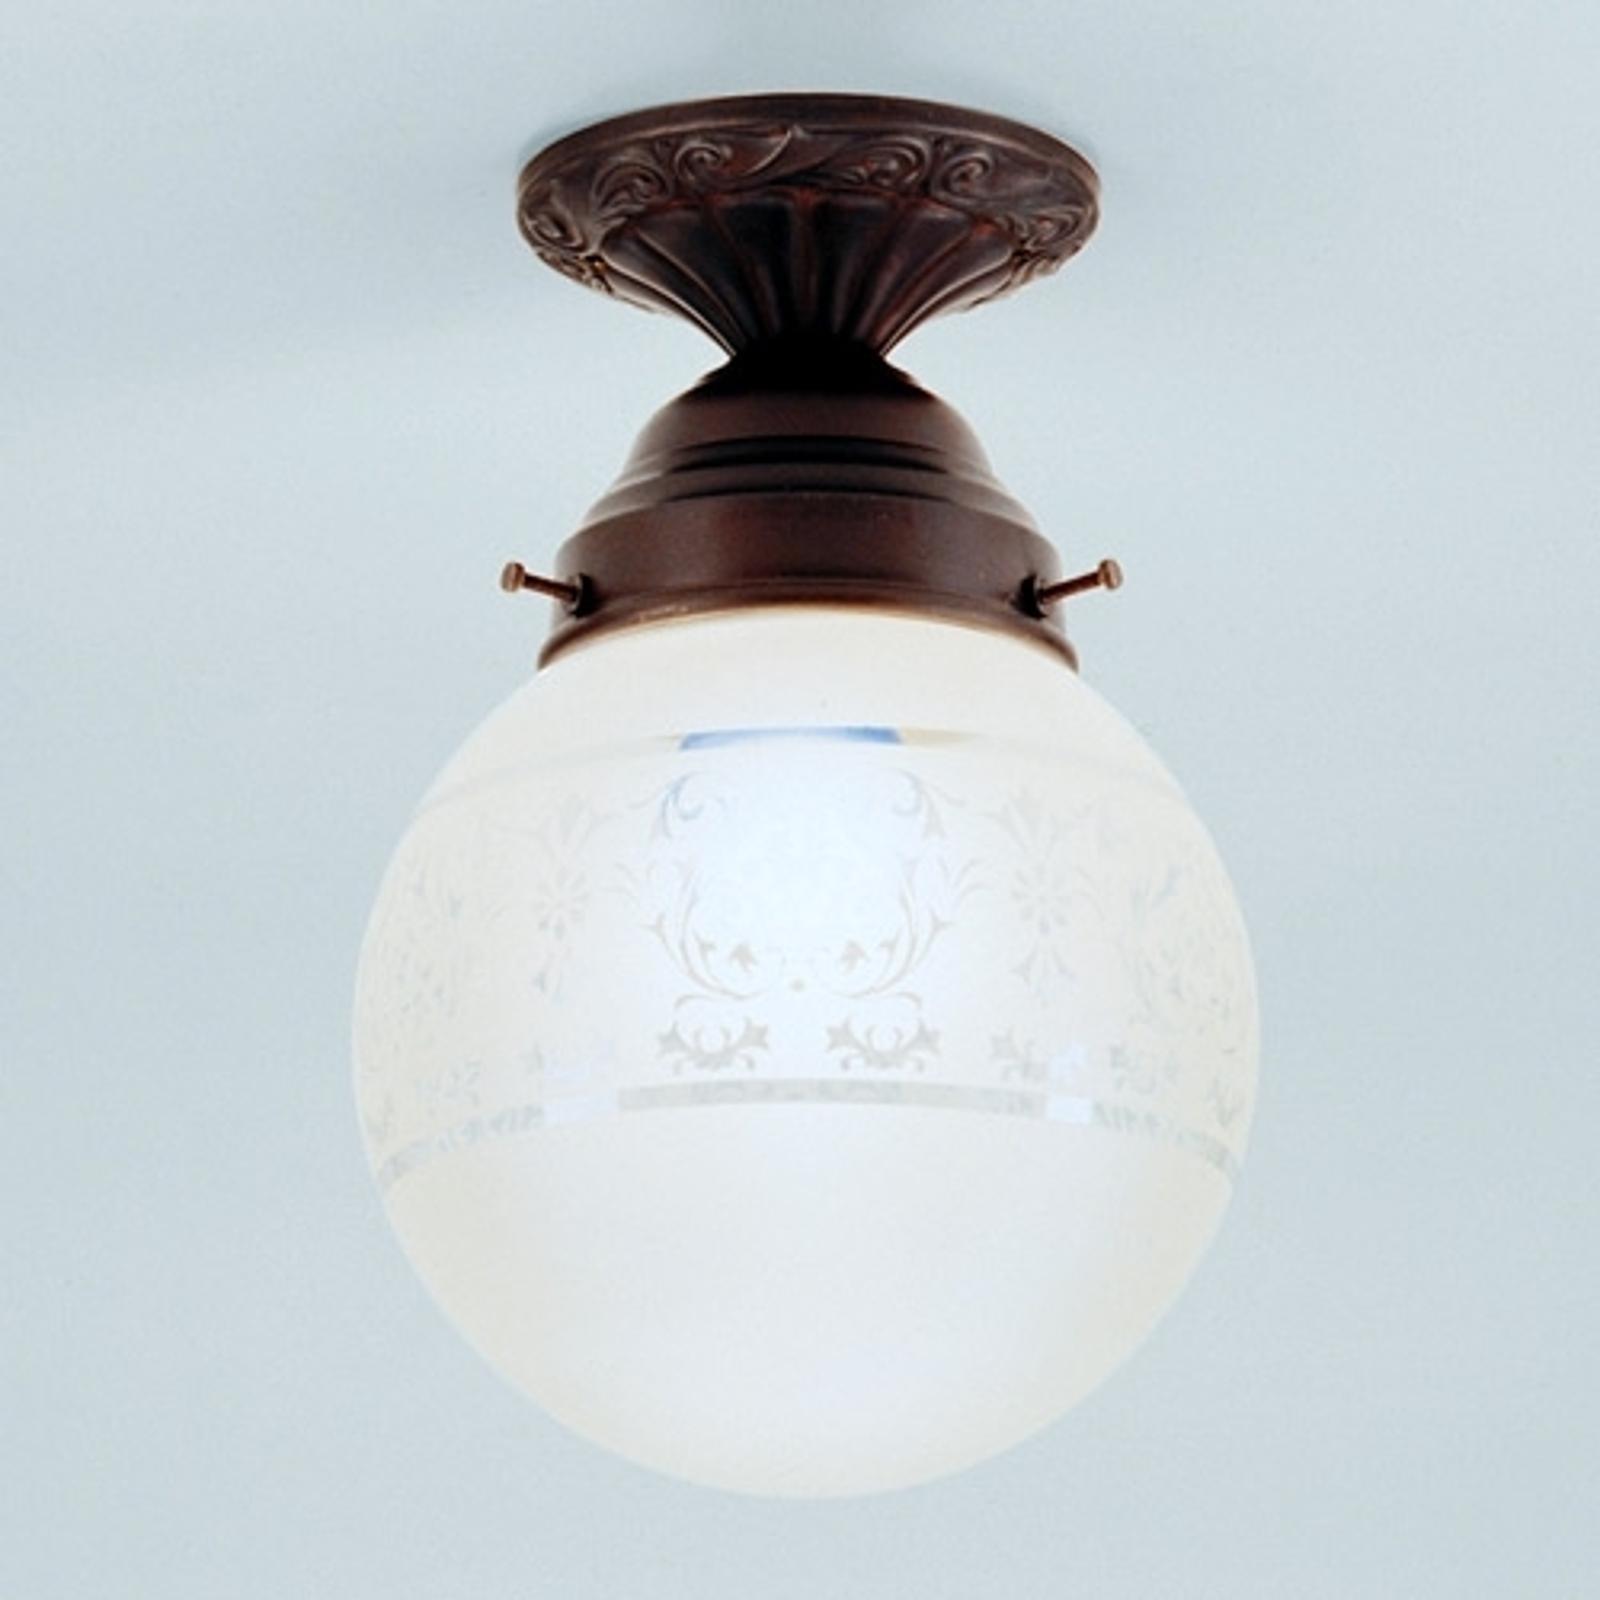 Jack - a handmade ceiling light_1542090_1